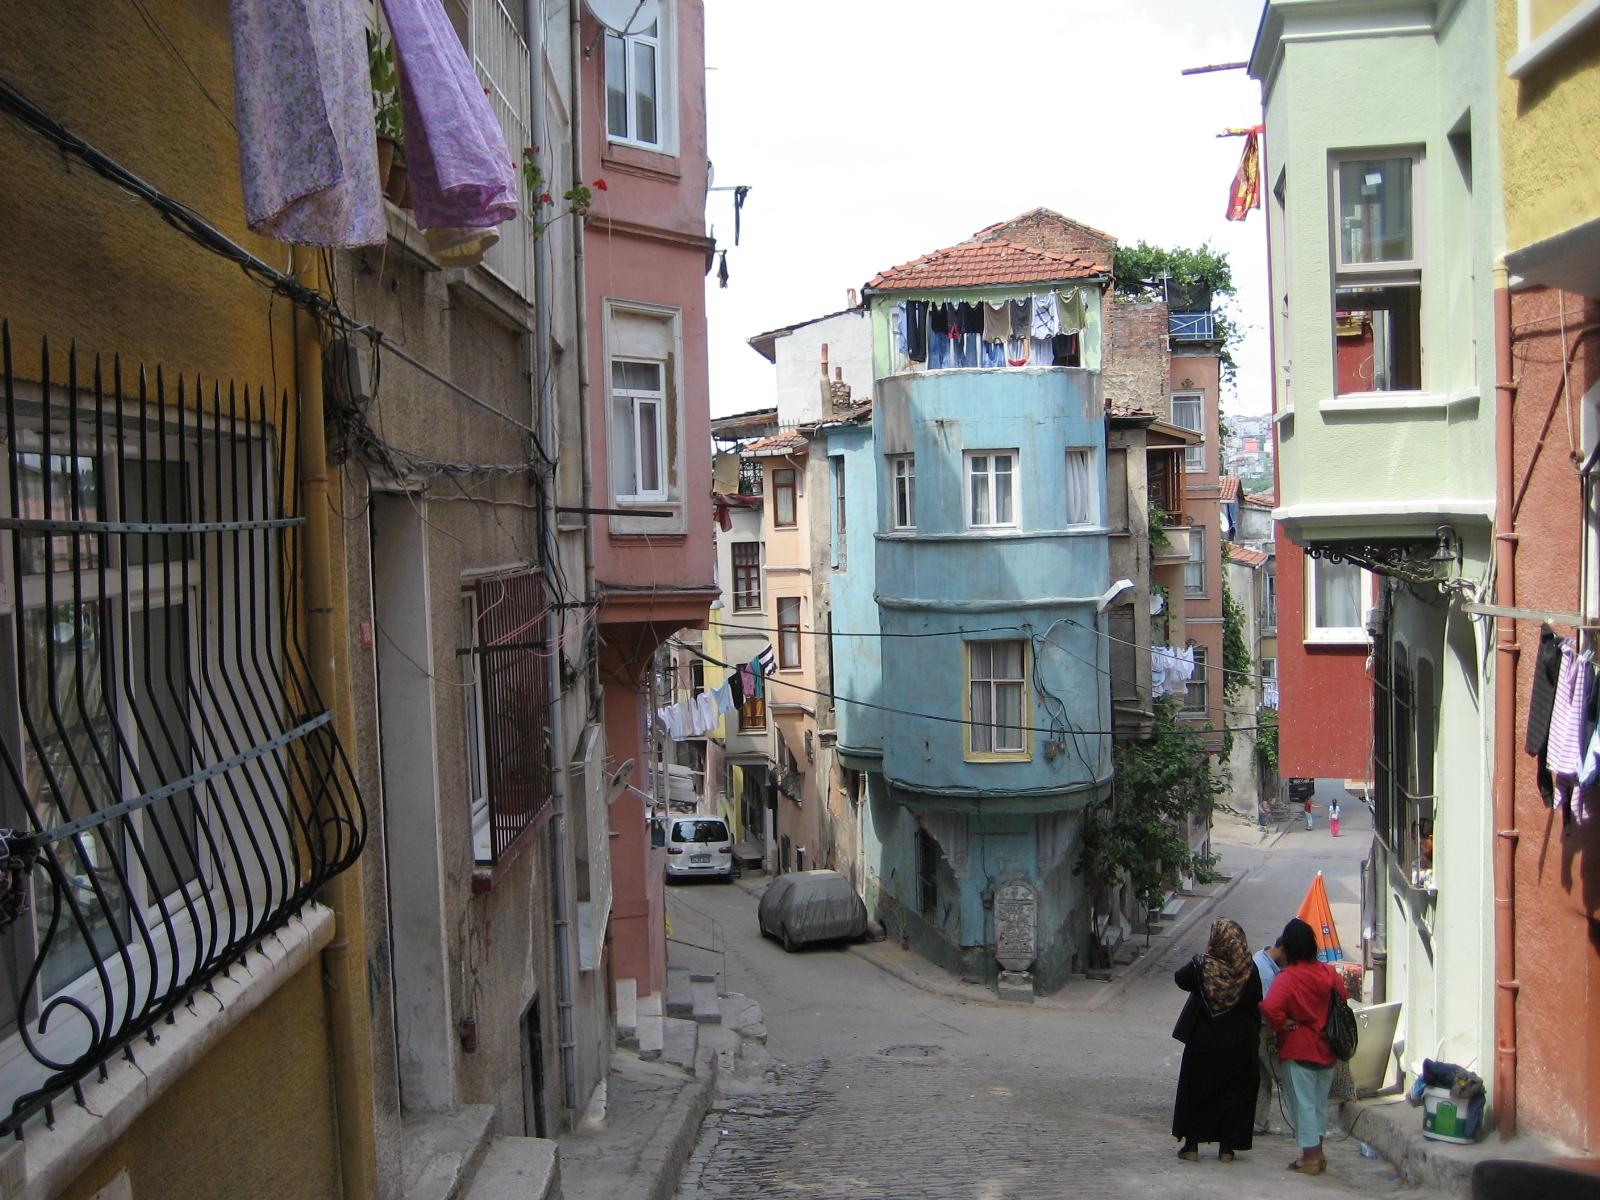 The Jewish quarter of Balat